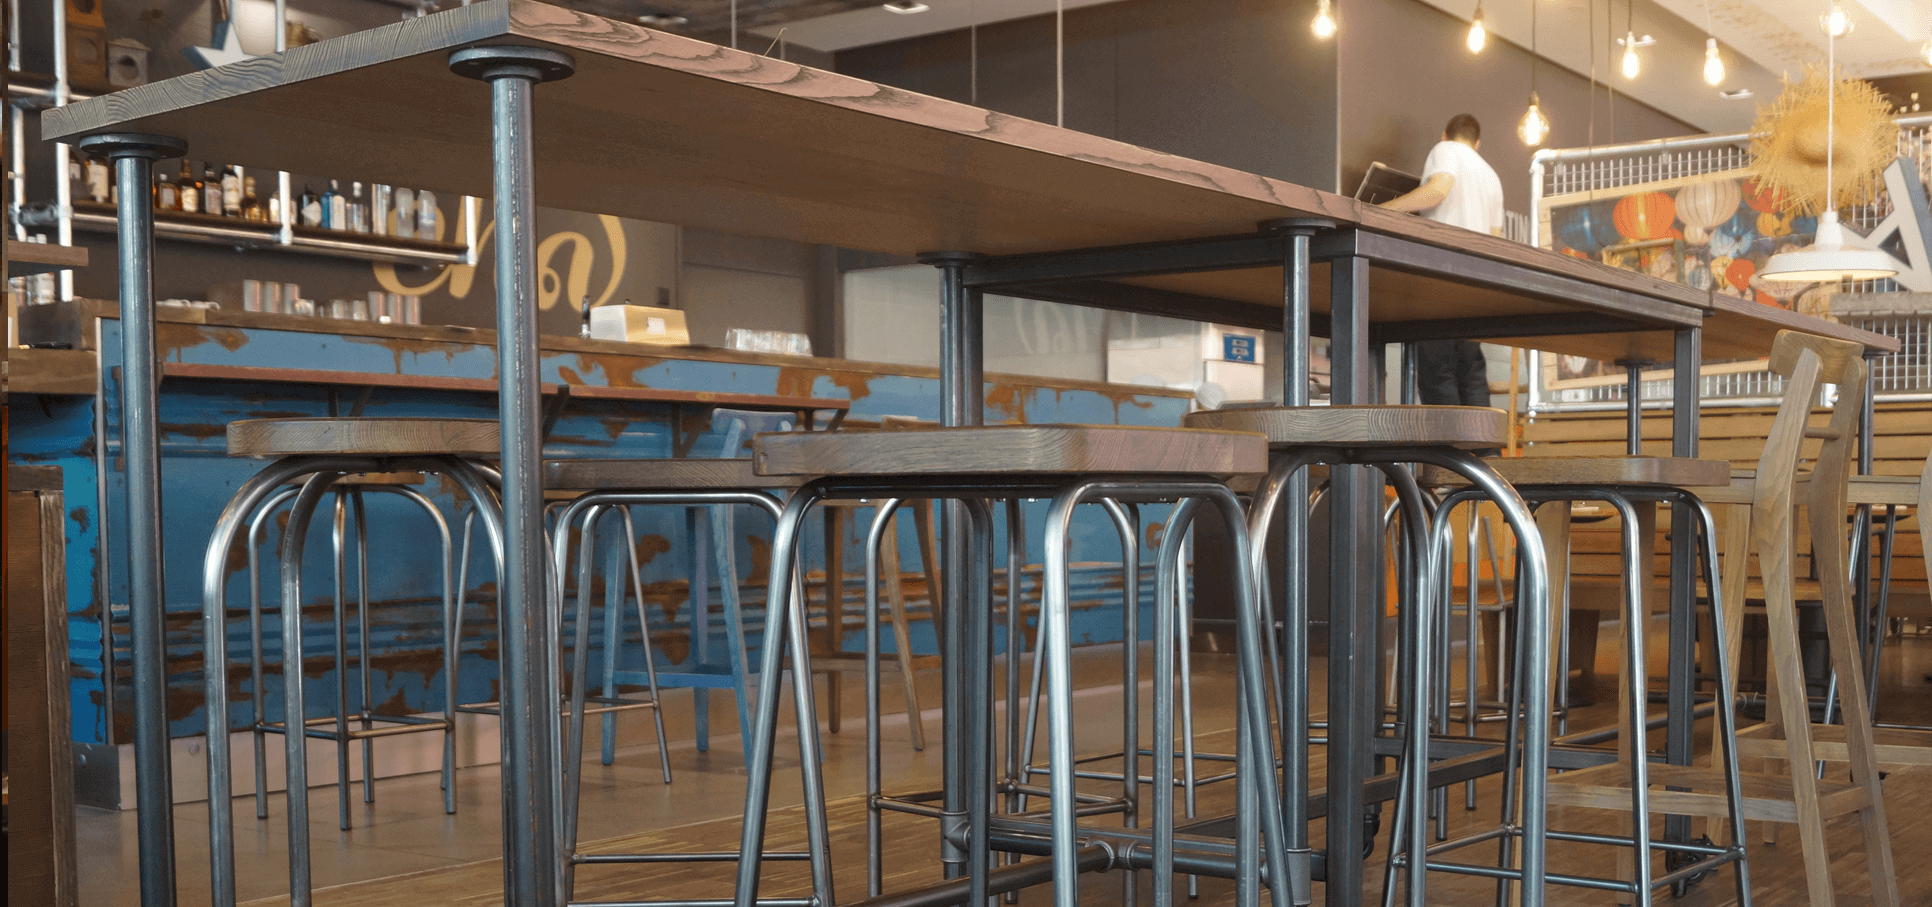 Ladenbau-Restaurant-ChaCha-rohrfabrik-vintage-rohre3.png